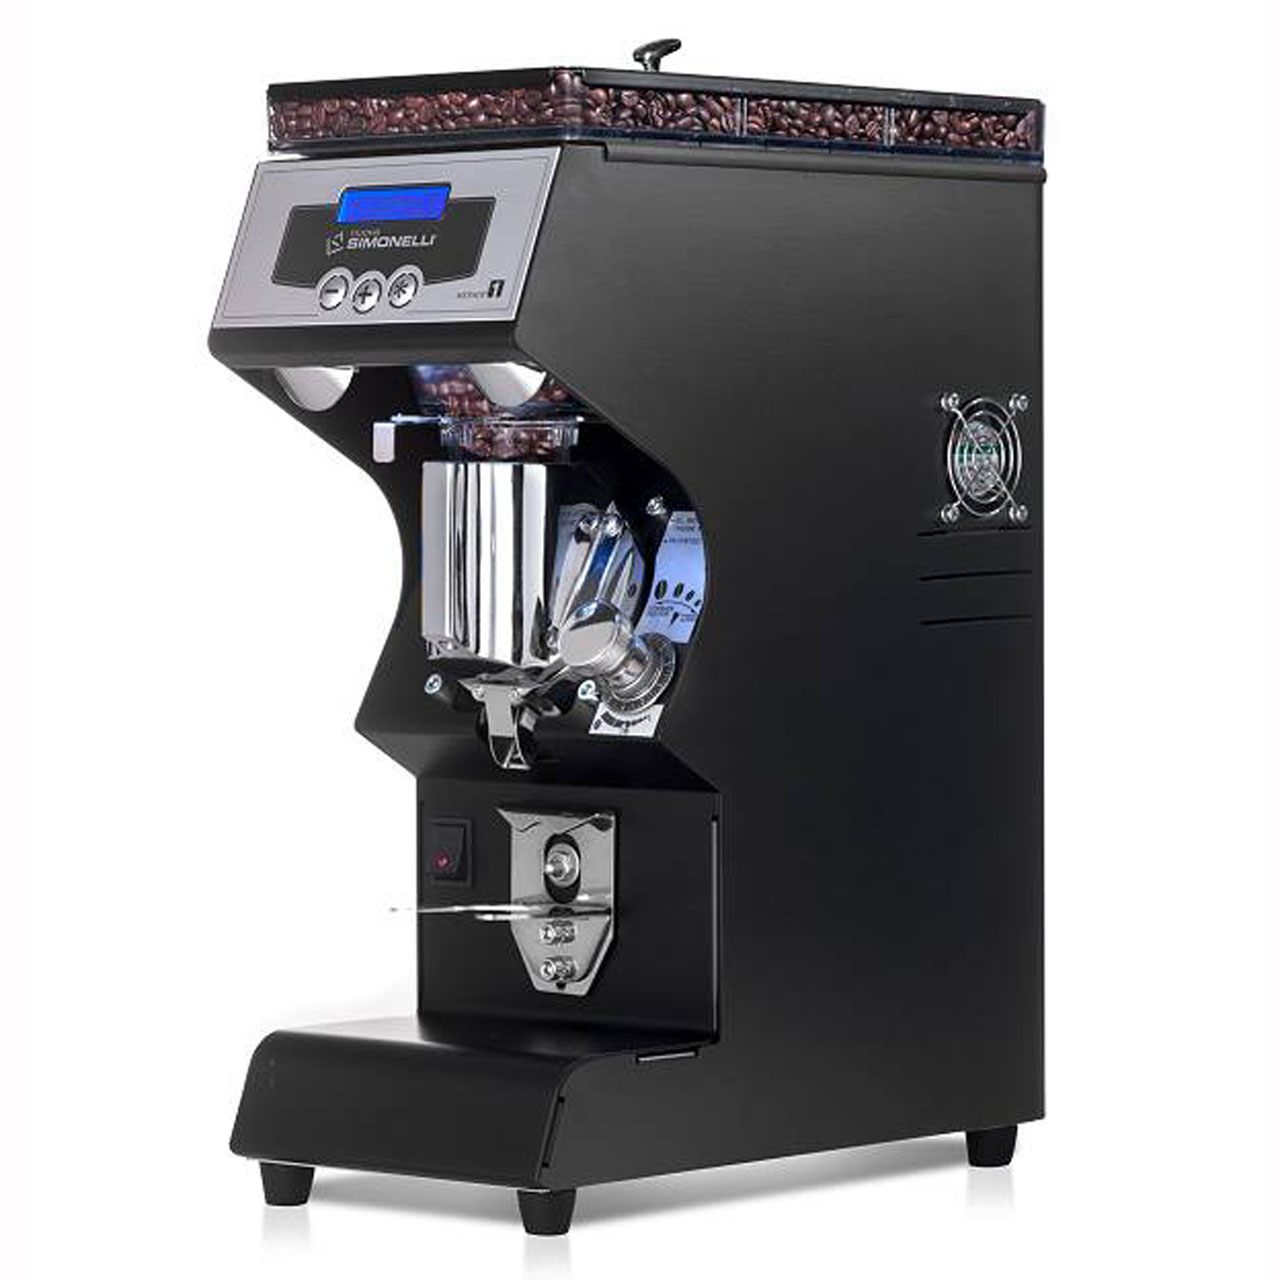 Кофемолка для кофемашины Nuova Simonelli MYTHOS 1, 220 V, COL BLACK